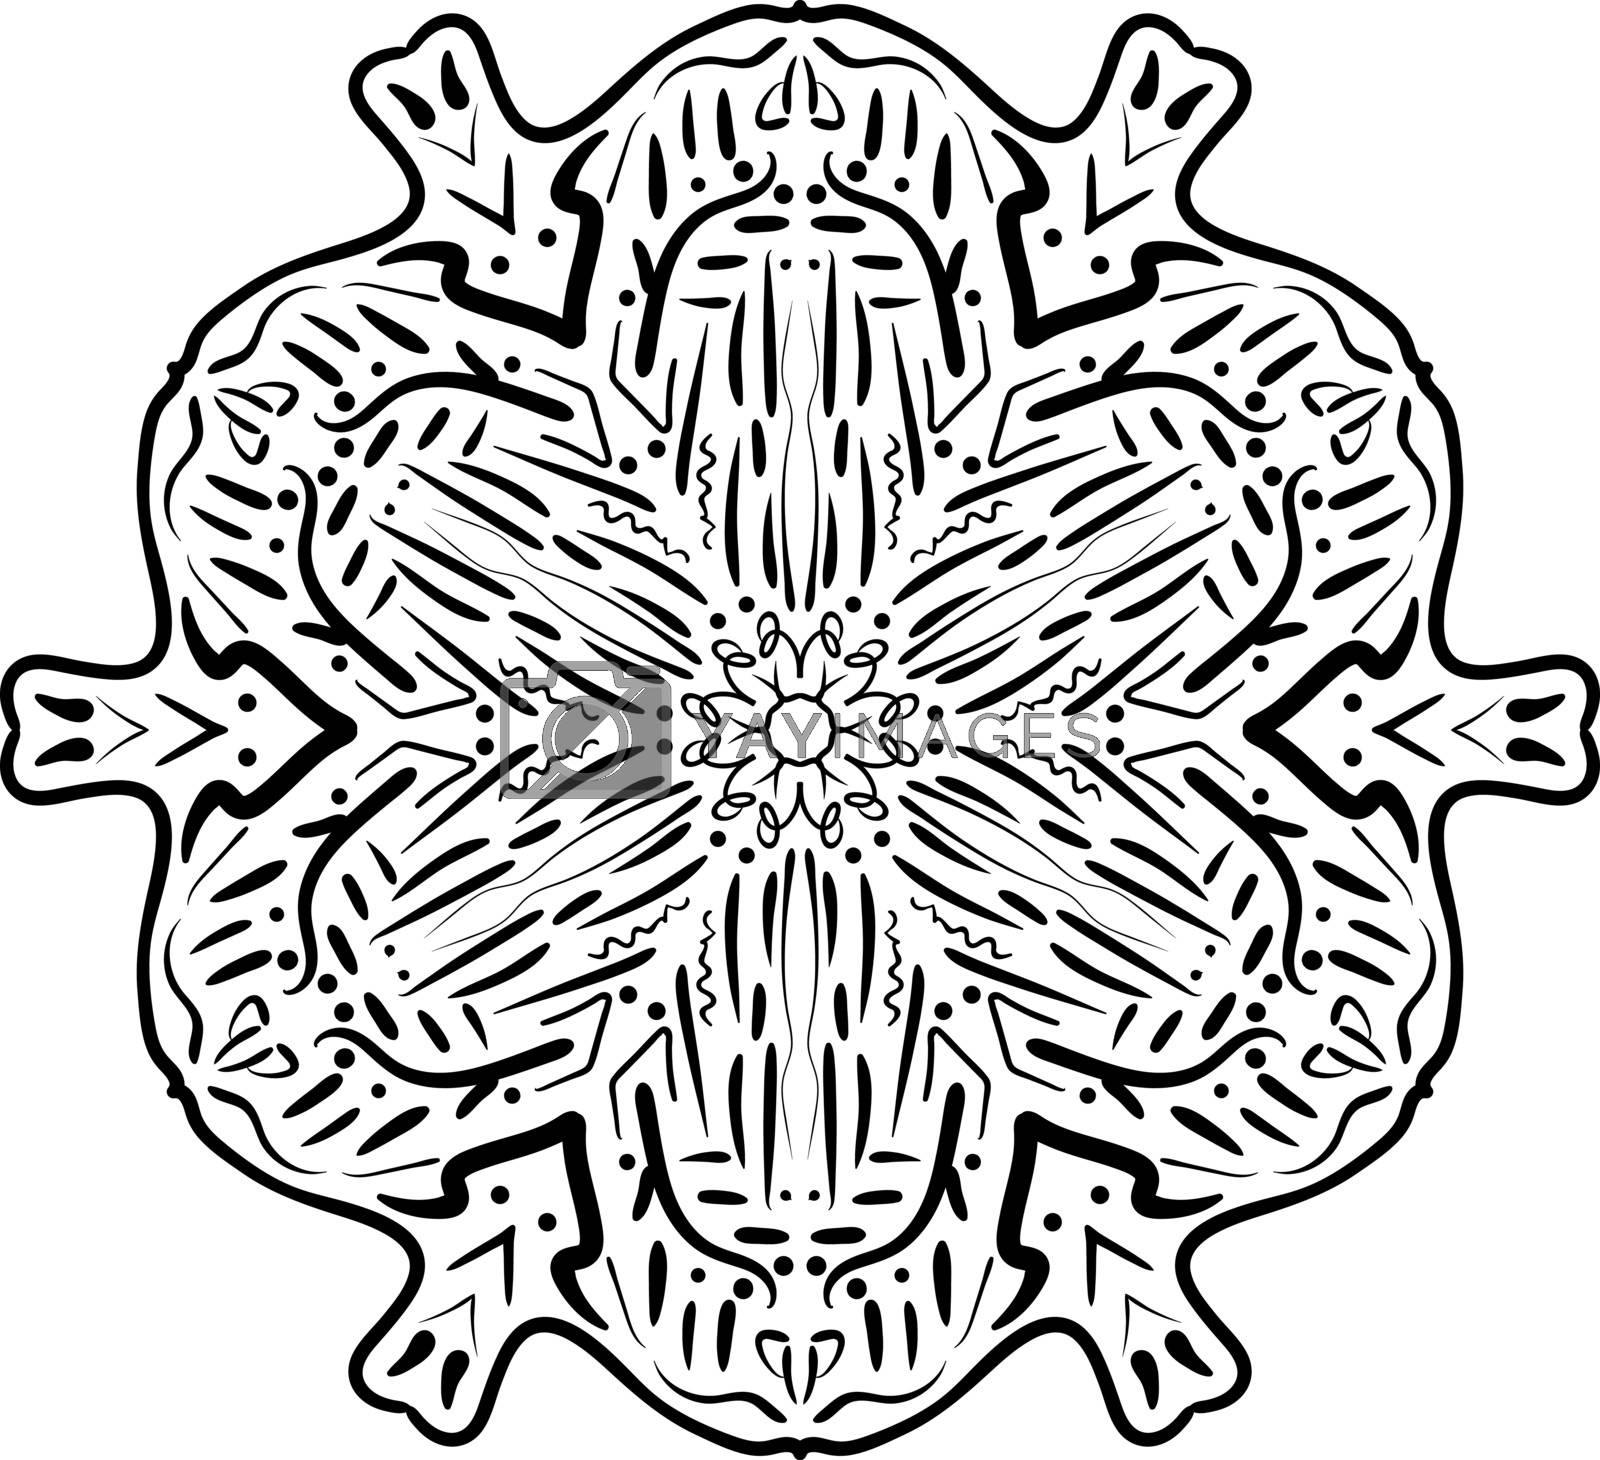 Mandala. Zentangle inspired vector illustration, black and white. Abstract diwali texture